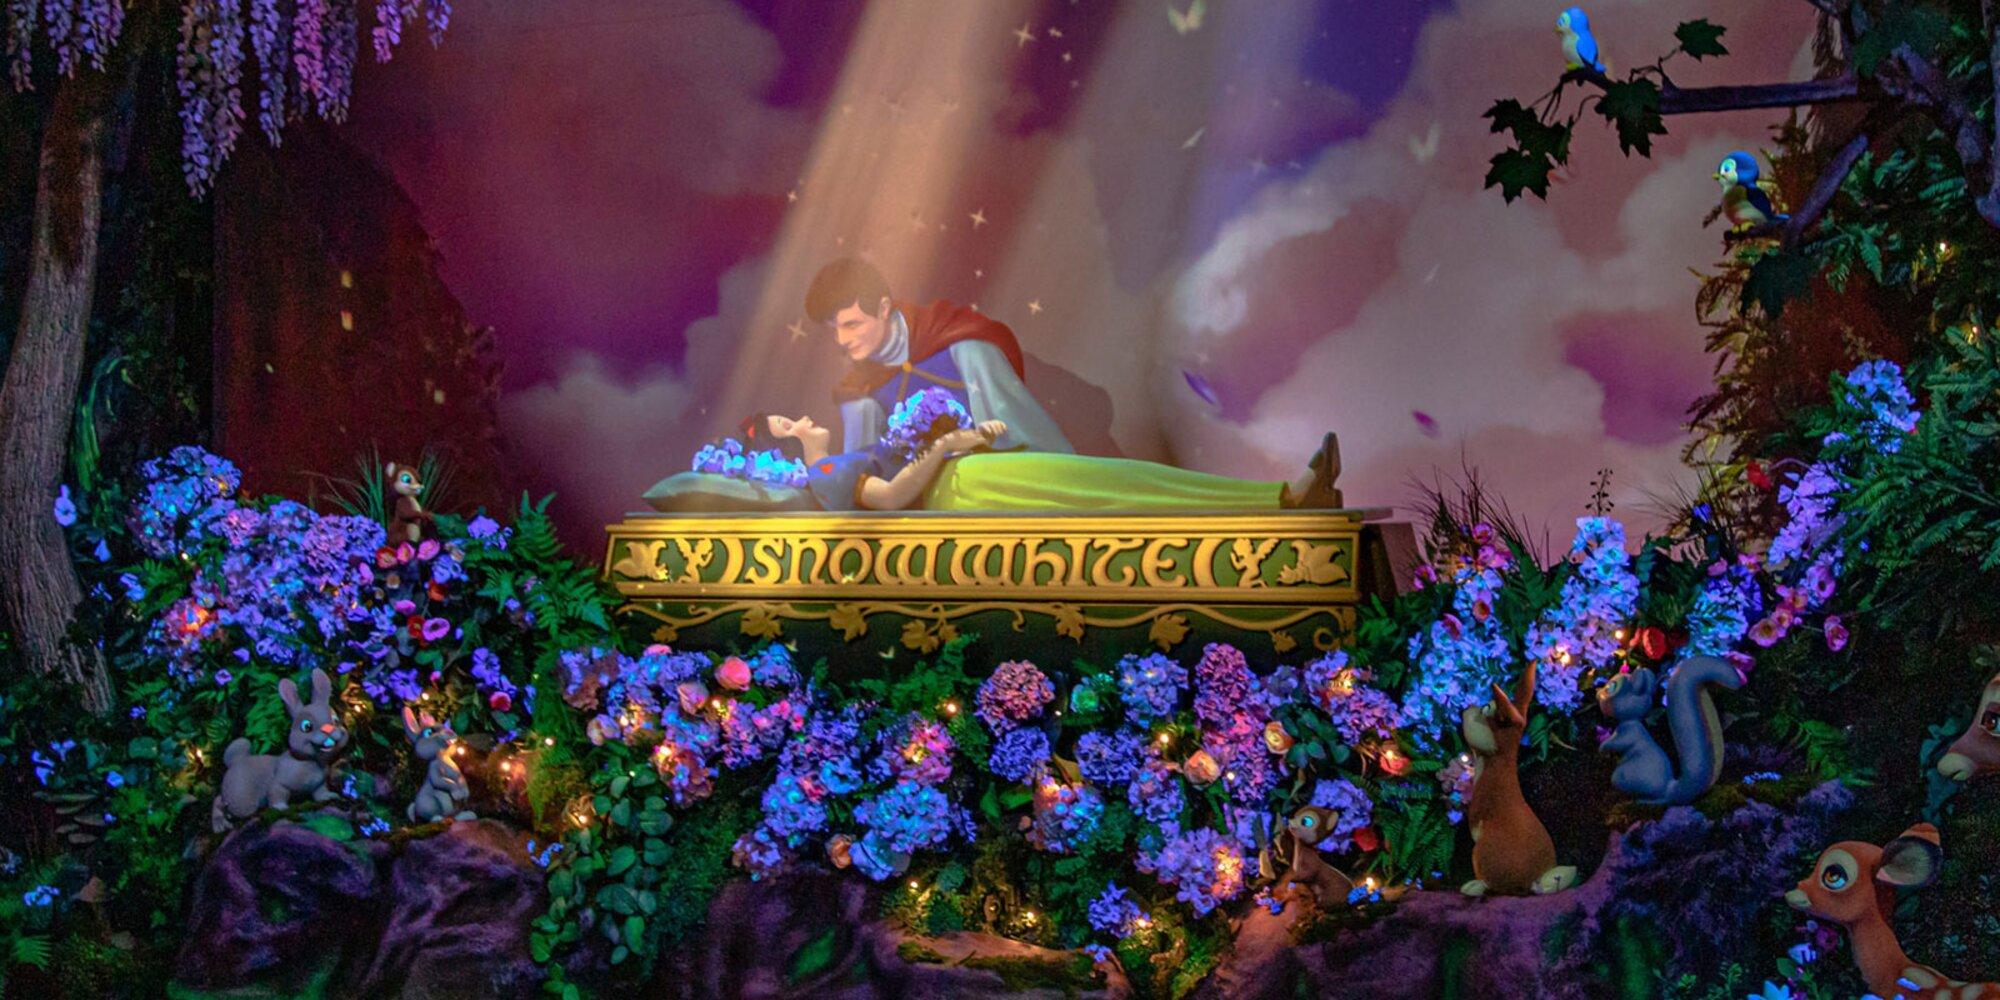 Disney Imagineer responds to backlash over Snow White ride's 'non-consensual' kiss